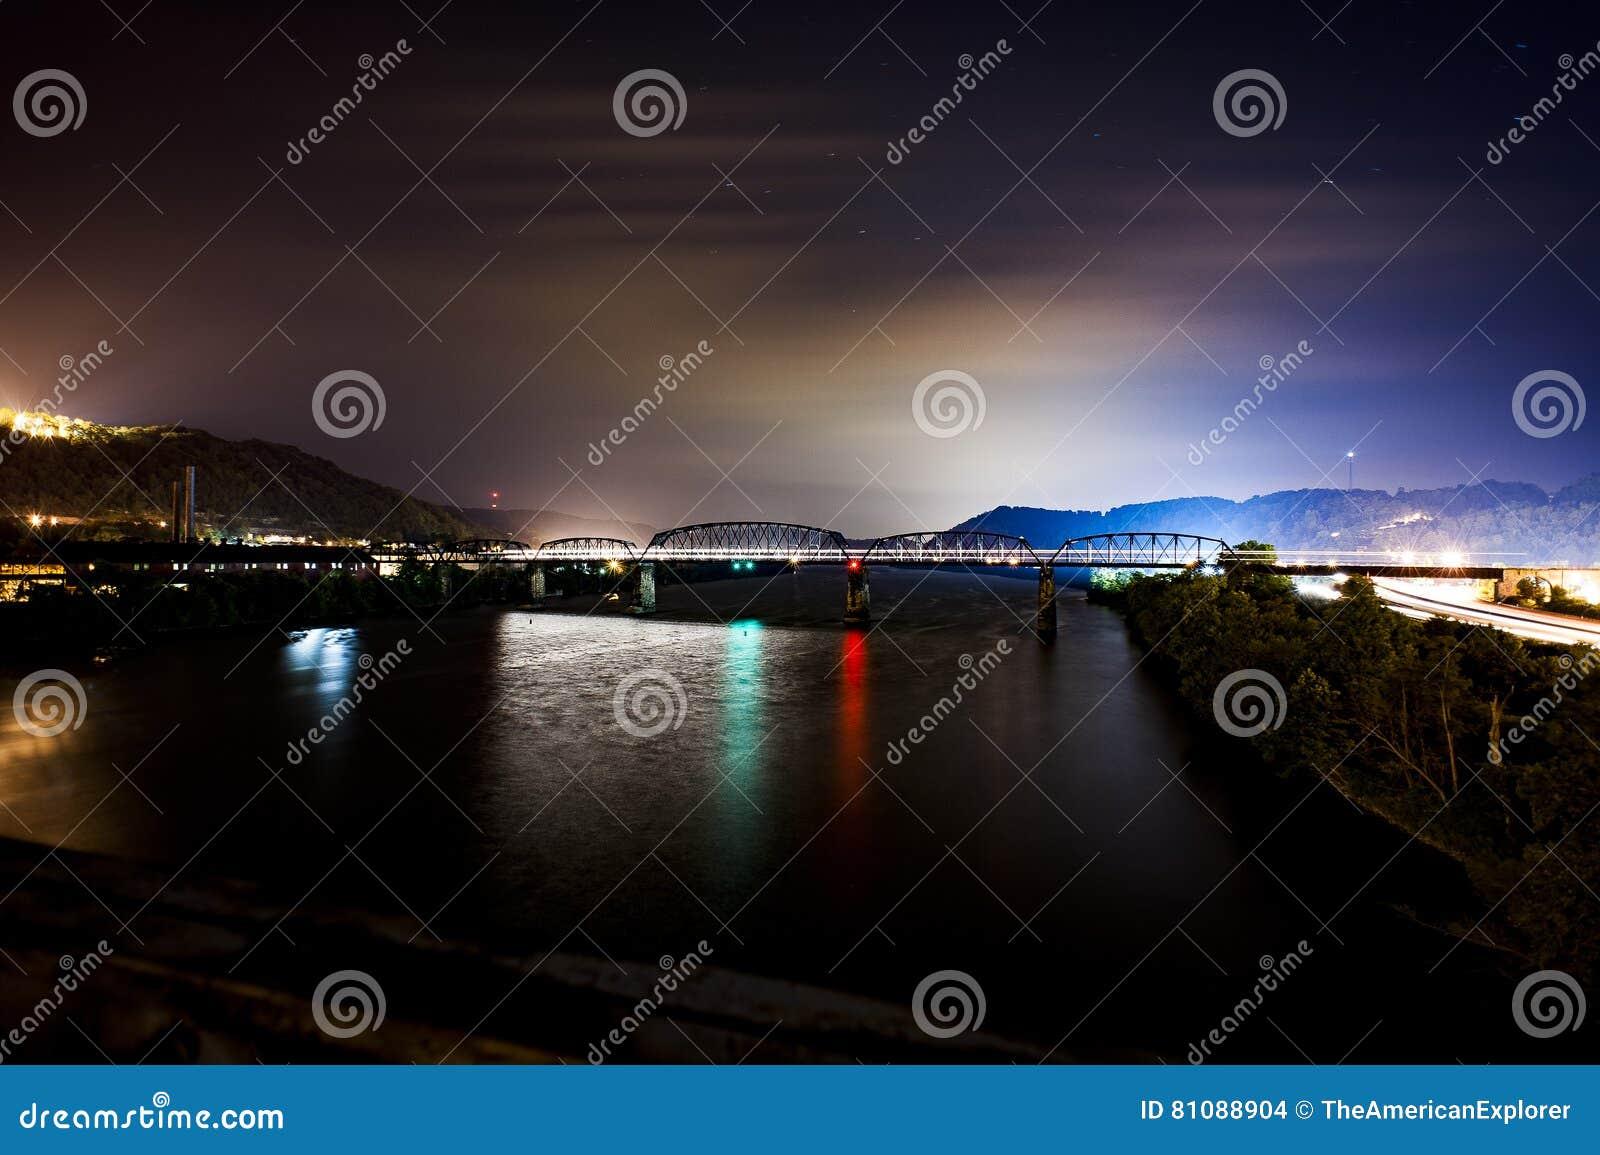 Мост железной дороги Балтимора & Огайо - Река Огайо